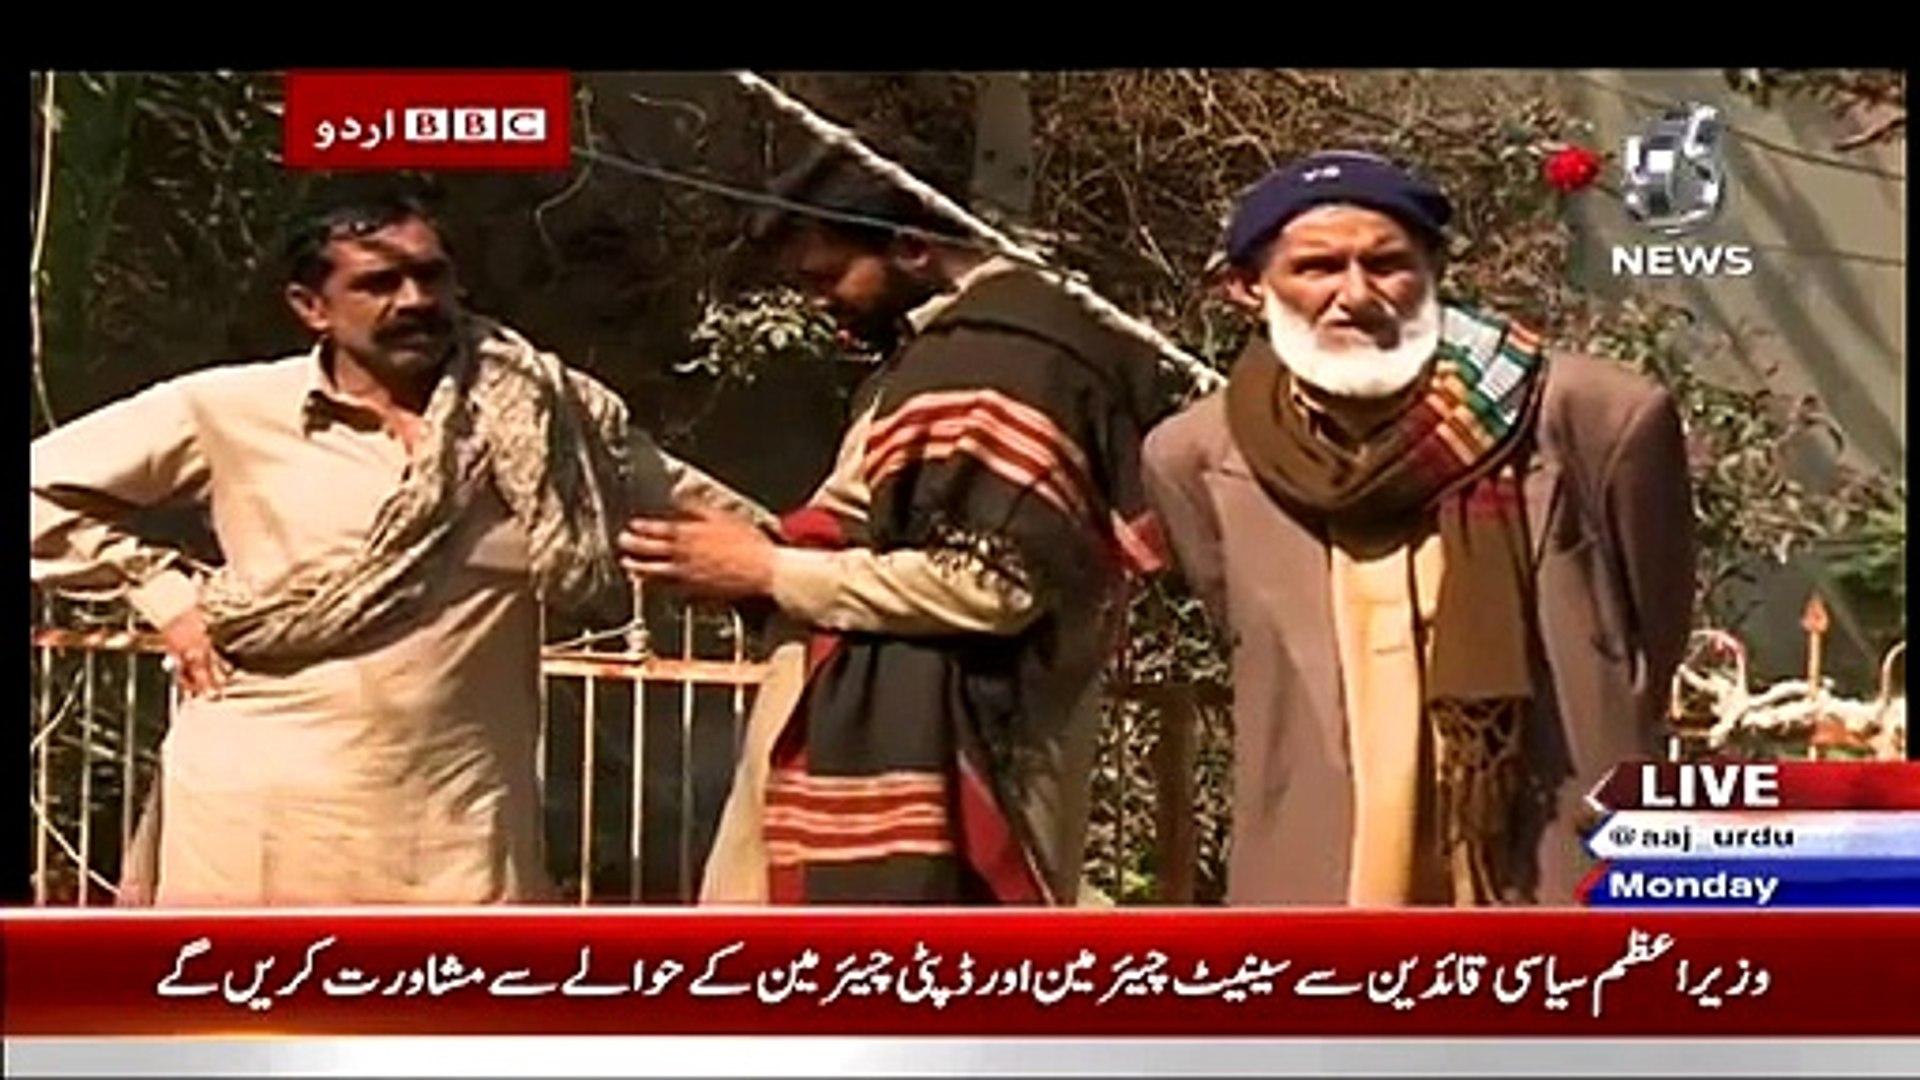 Bbc Urdu Sairbeen On Aaj News – 9th March 2015 On Aaj News